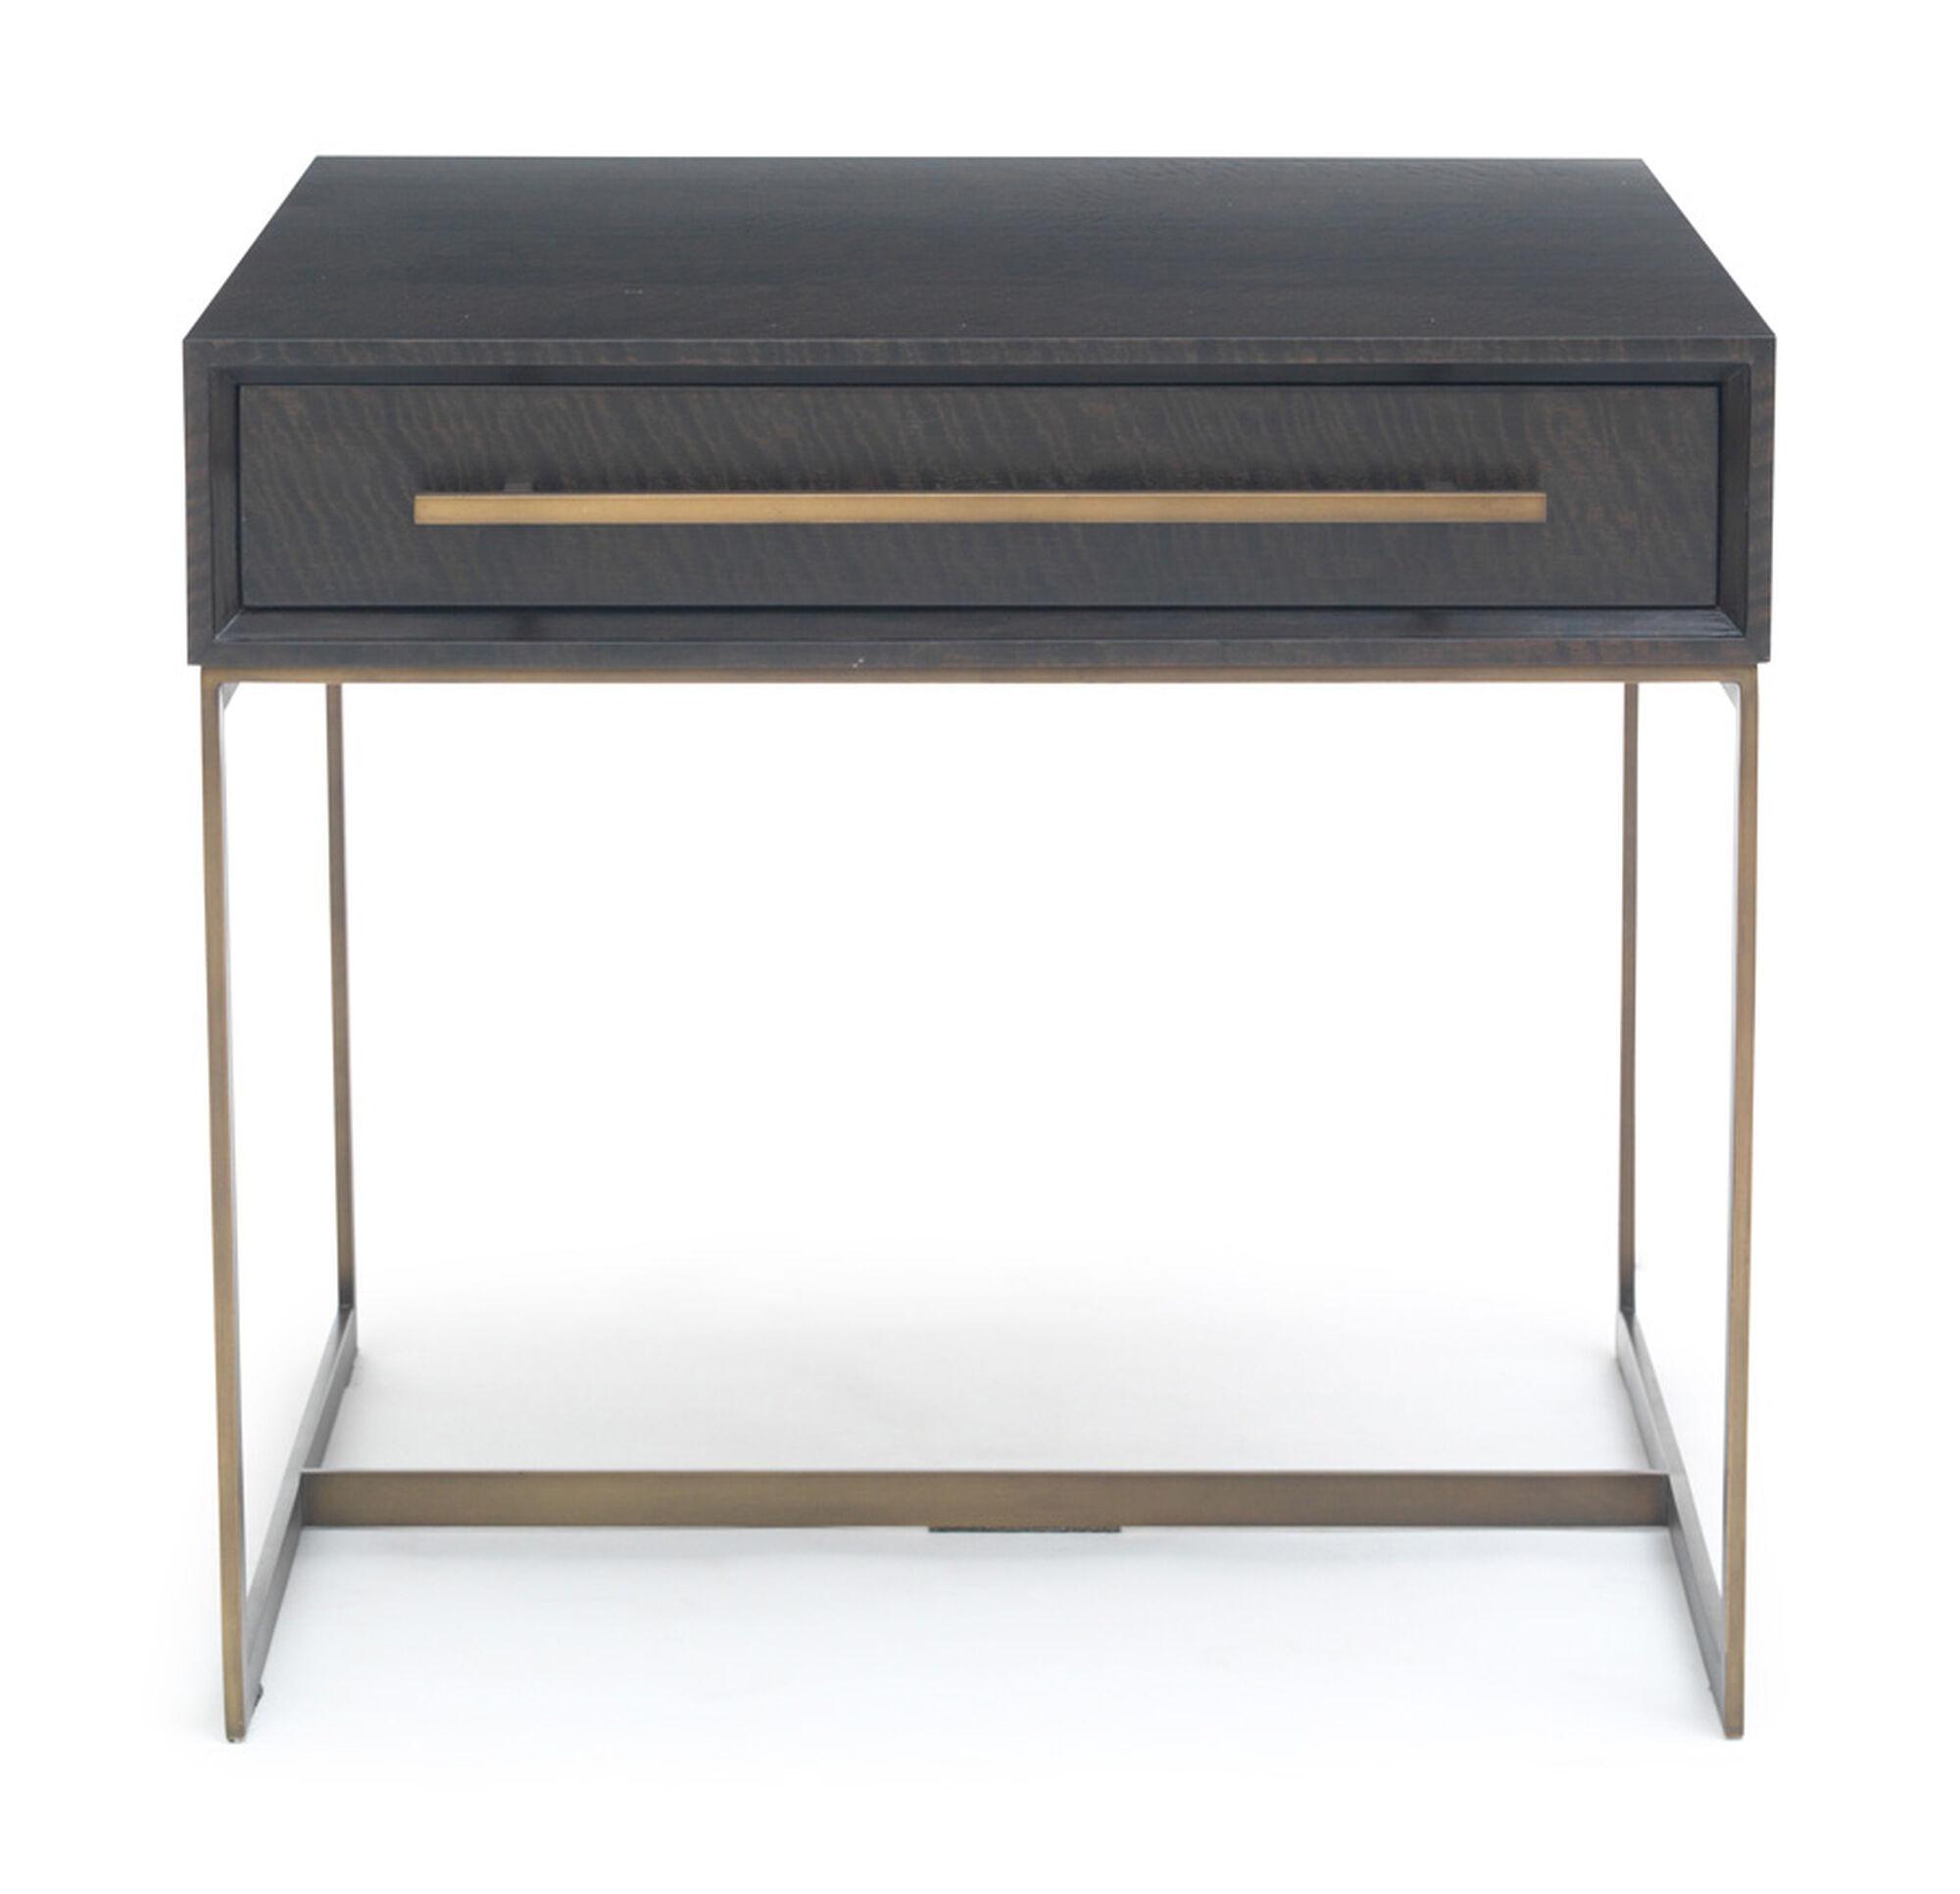 details drawer bungalow product lg gray side bergamo bgo table